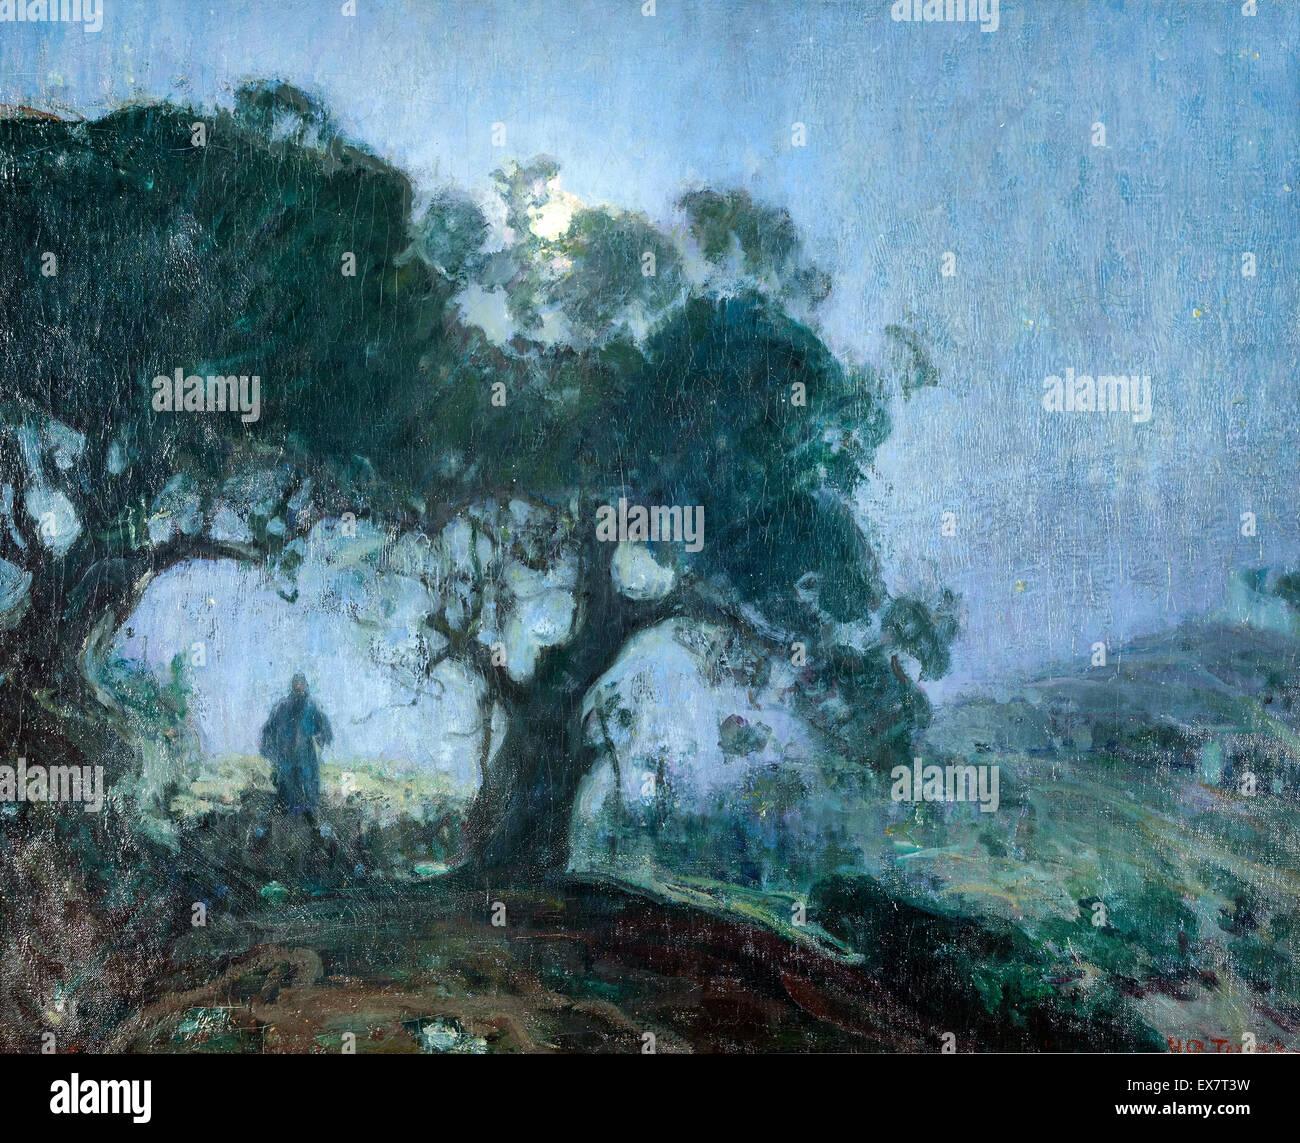 Henry Ossawa Tanner, The Good Shepherd 1902-1903 Oil on canvas. Zimmerli Art Museum at Rutgers University, New Brunswick, - Stock Image